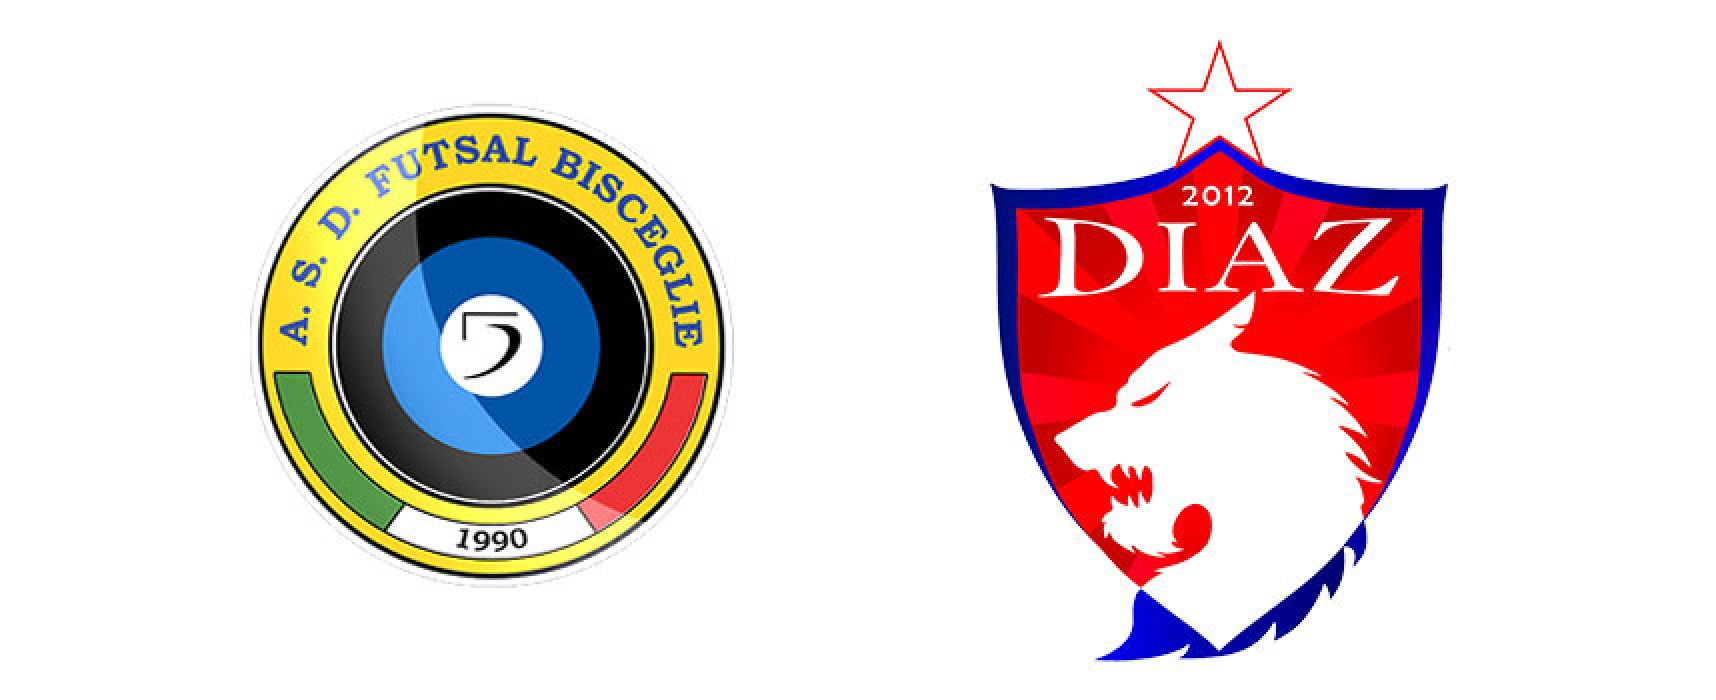 Calendari calcio a 5: esordio casalingo per la Diaz, Futsal Bisceglie a Sammichele